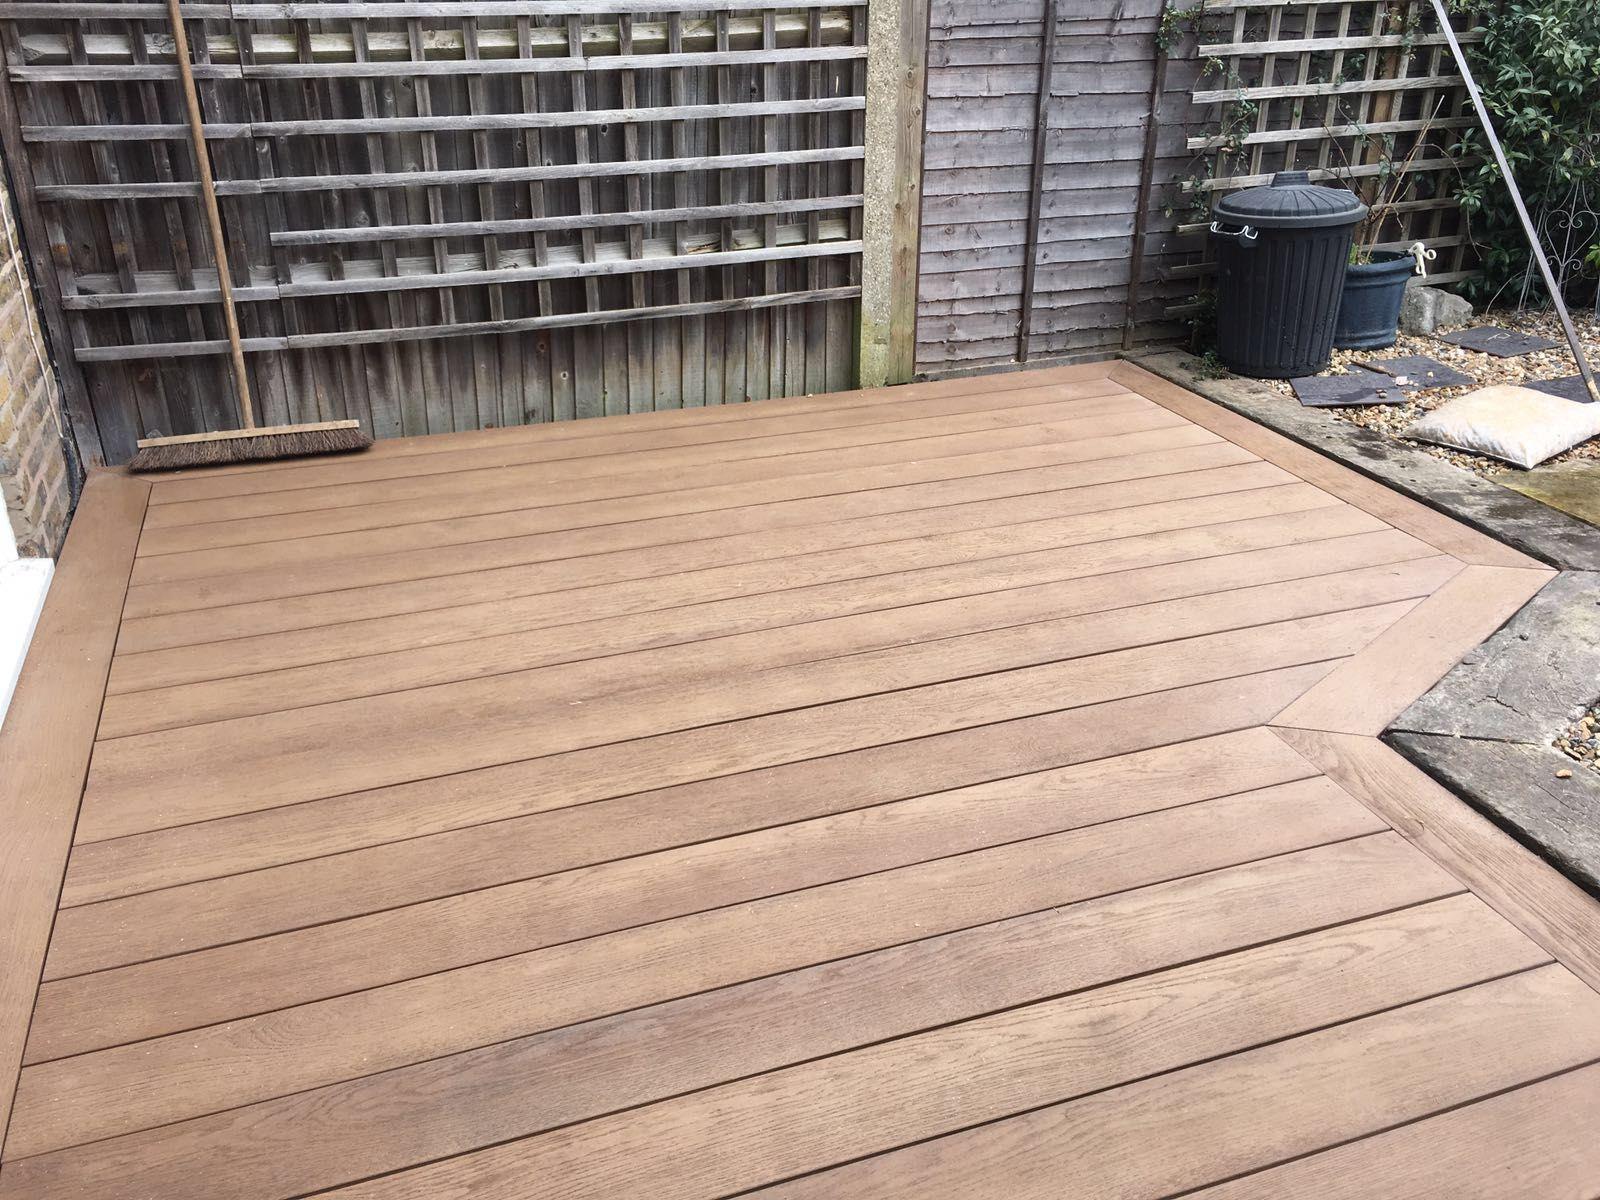 Millboard composite decking garden ideas pinterest composite